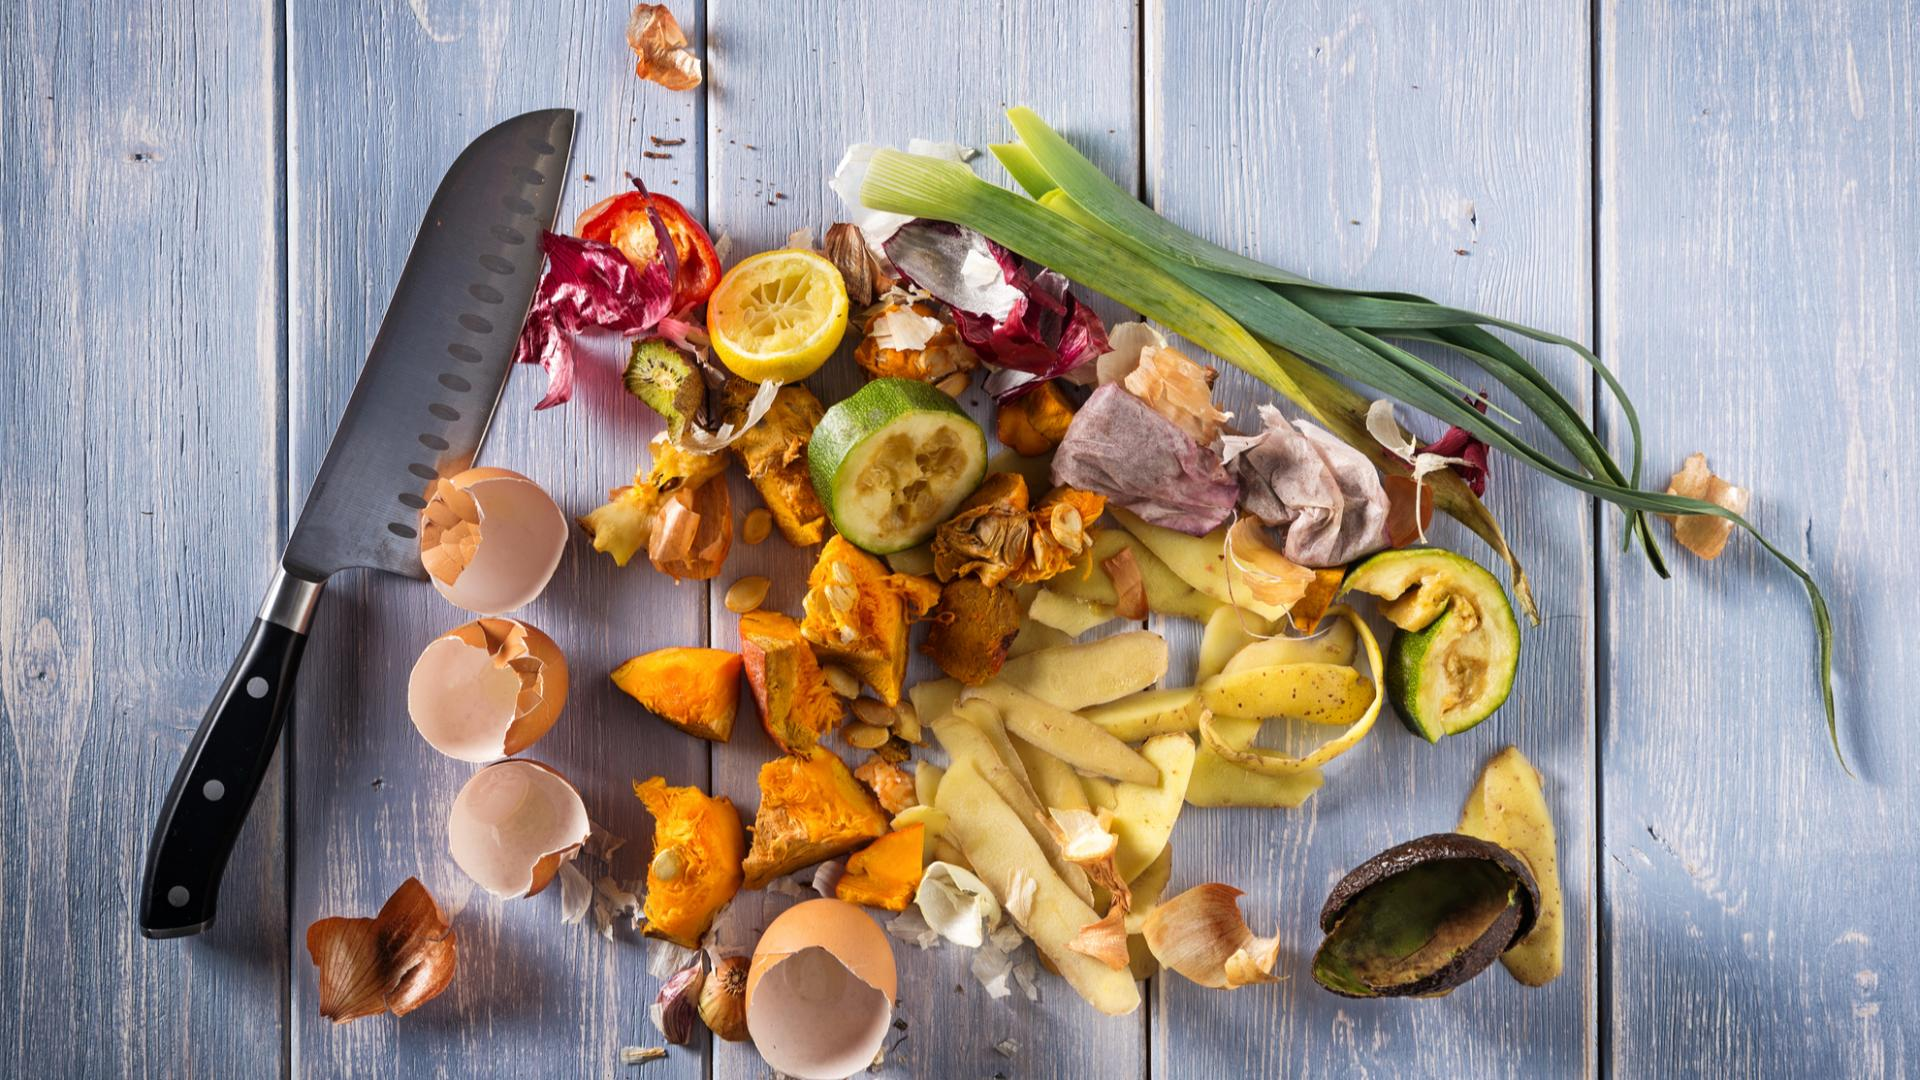 Essensreste Lebensmittel Müll Abfall